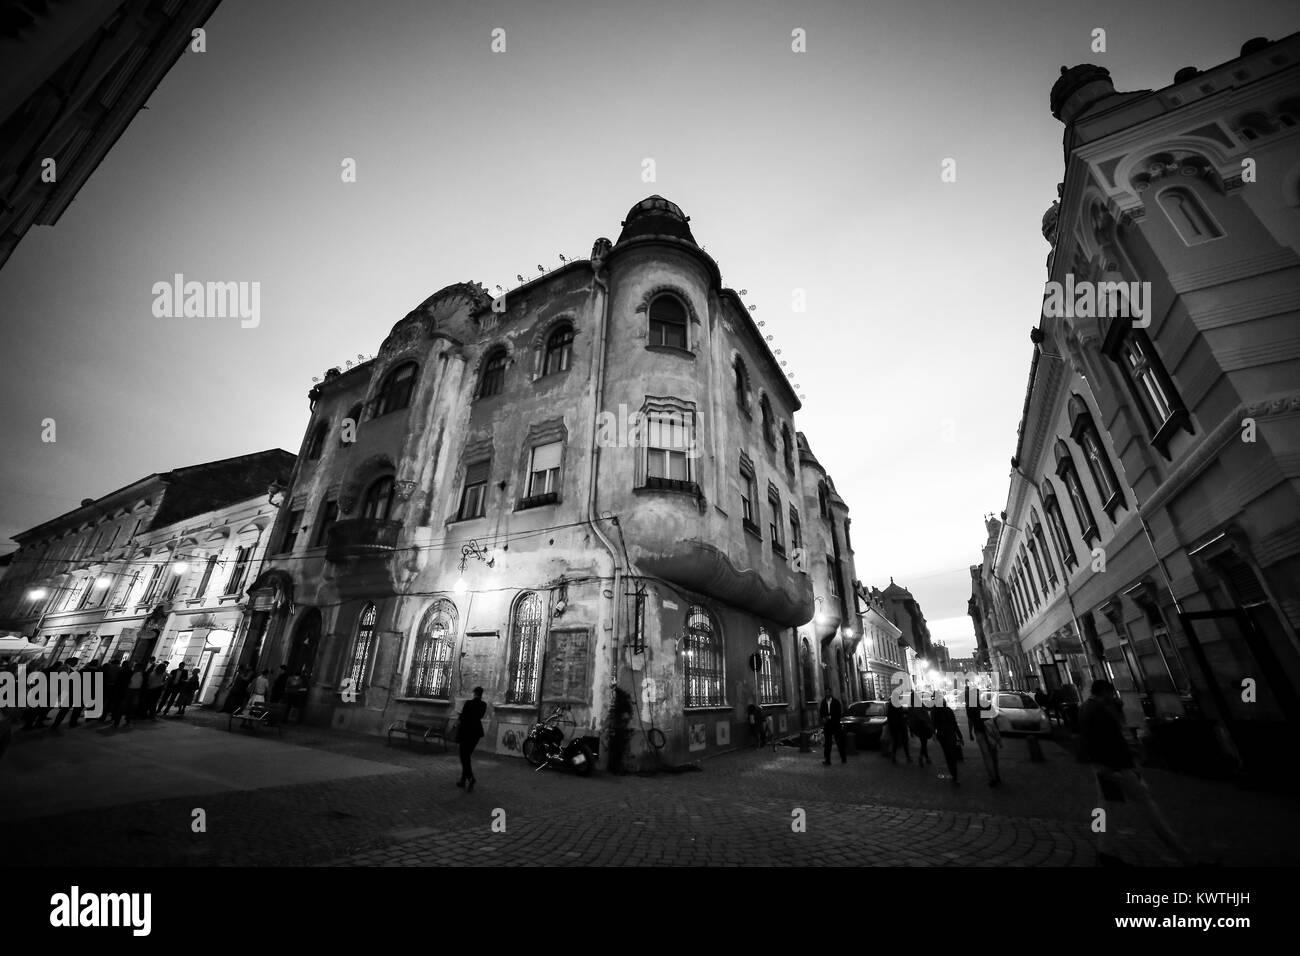 Gaudi style building in Piata Unirii (Union Square), Timisoara, Romania - Stock Image